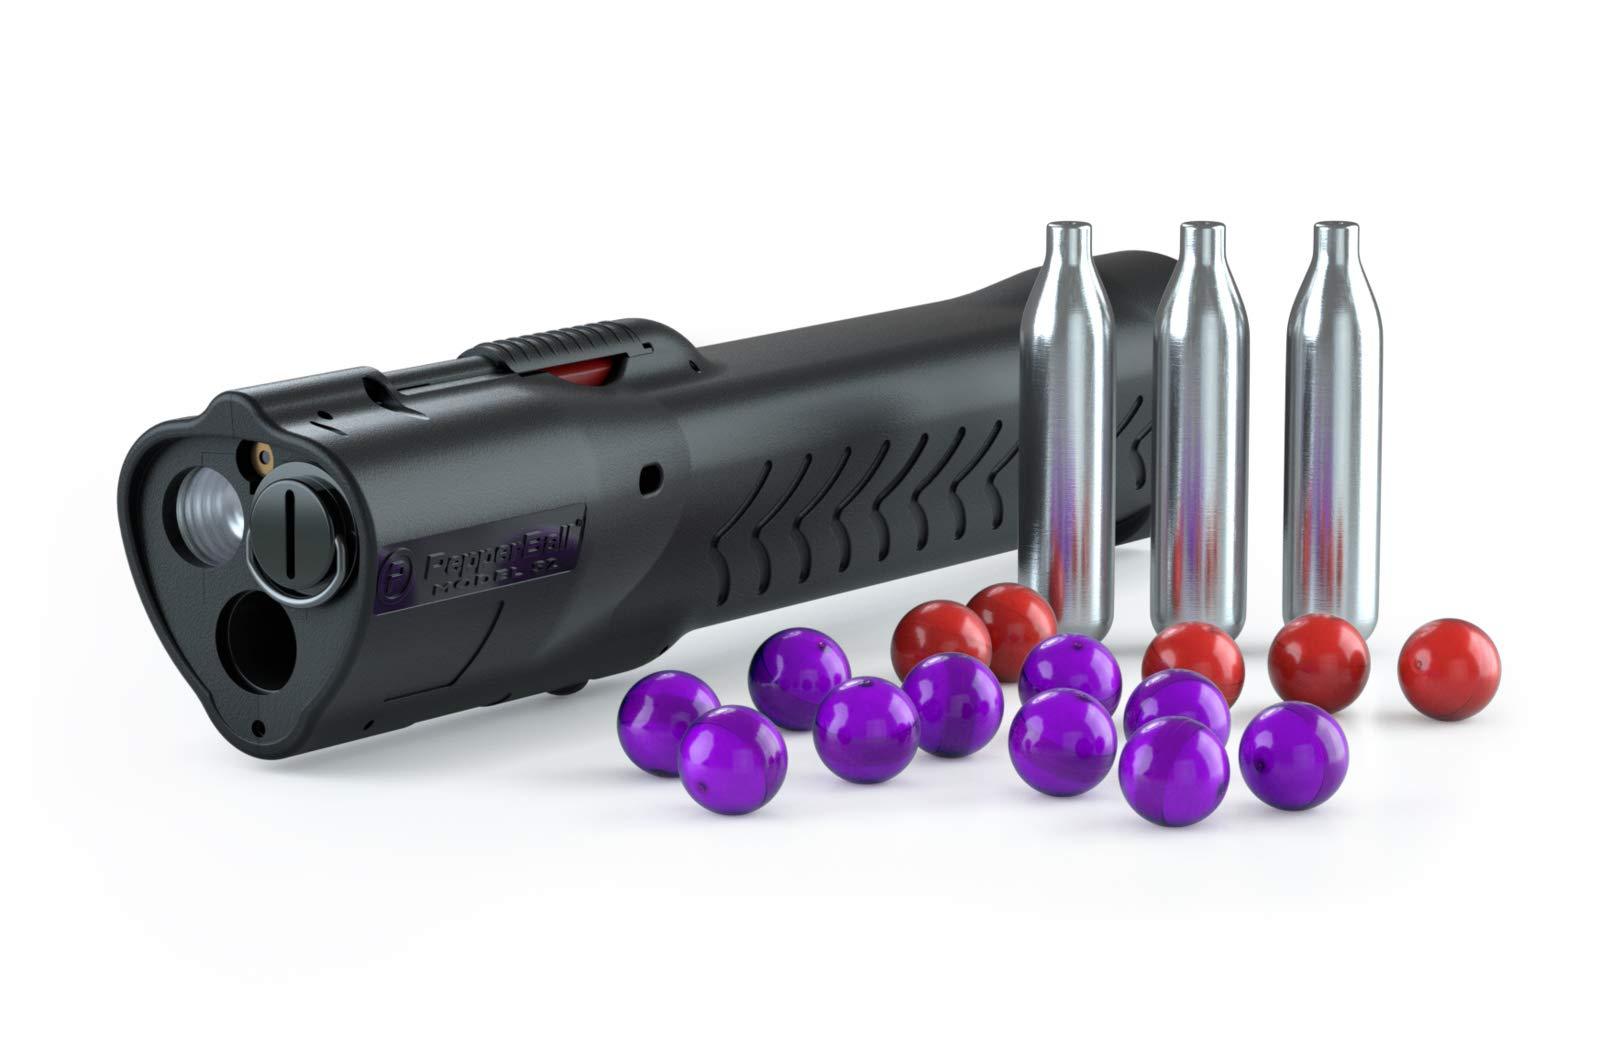 PepperBall LifeLite Self- Defense Starting Kit (Bright LED Flashlight with a Launcher)